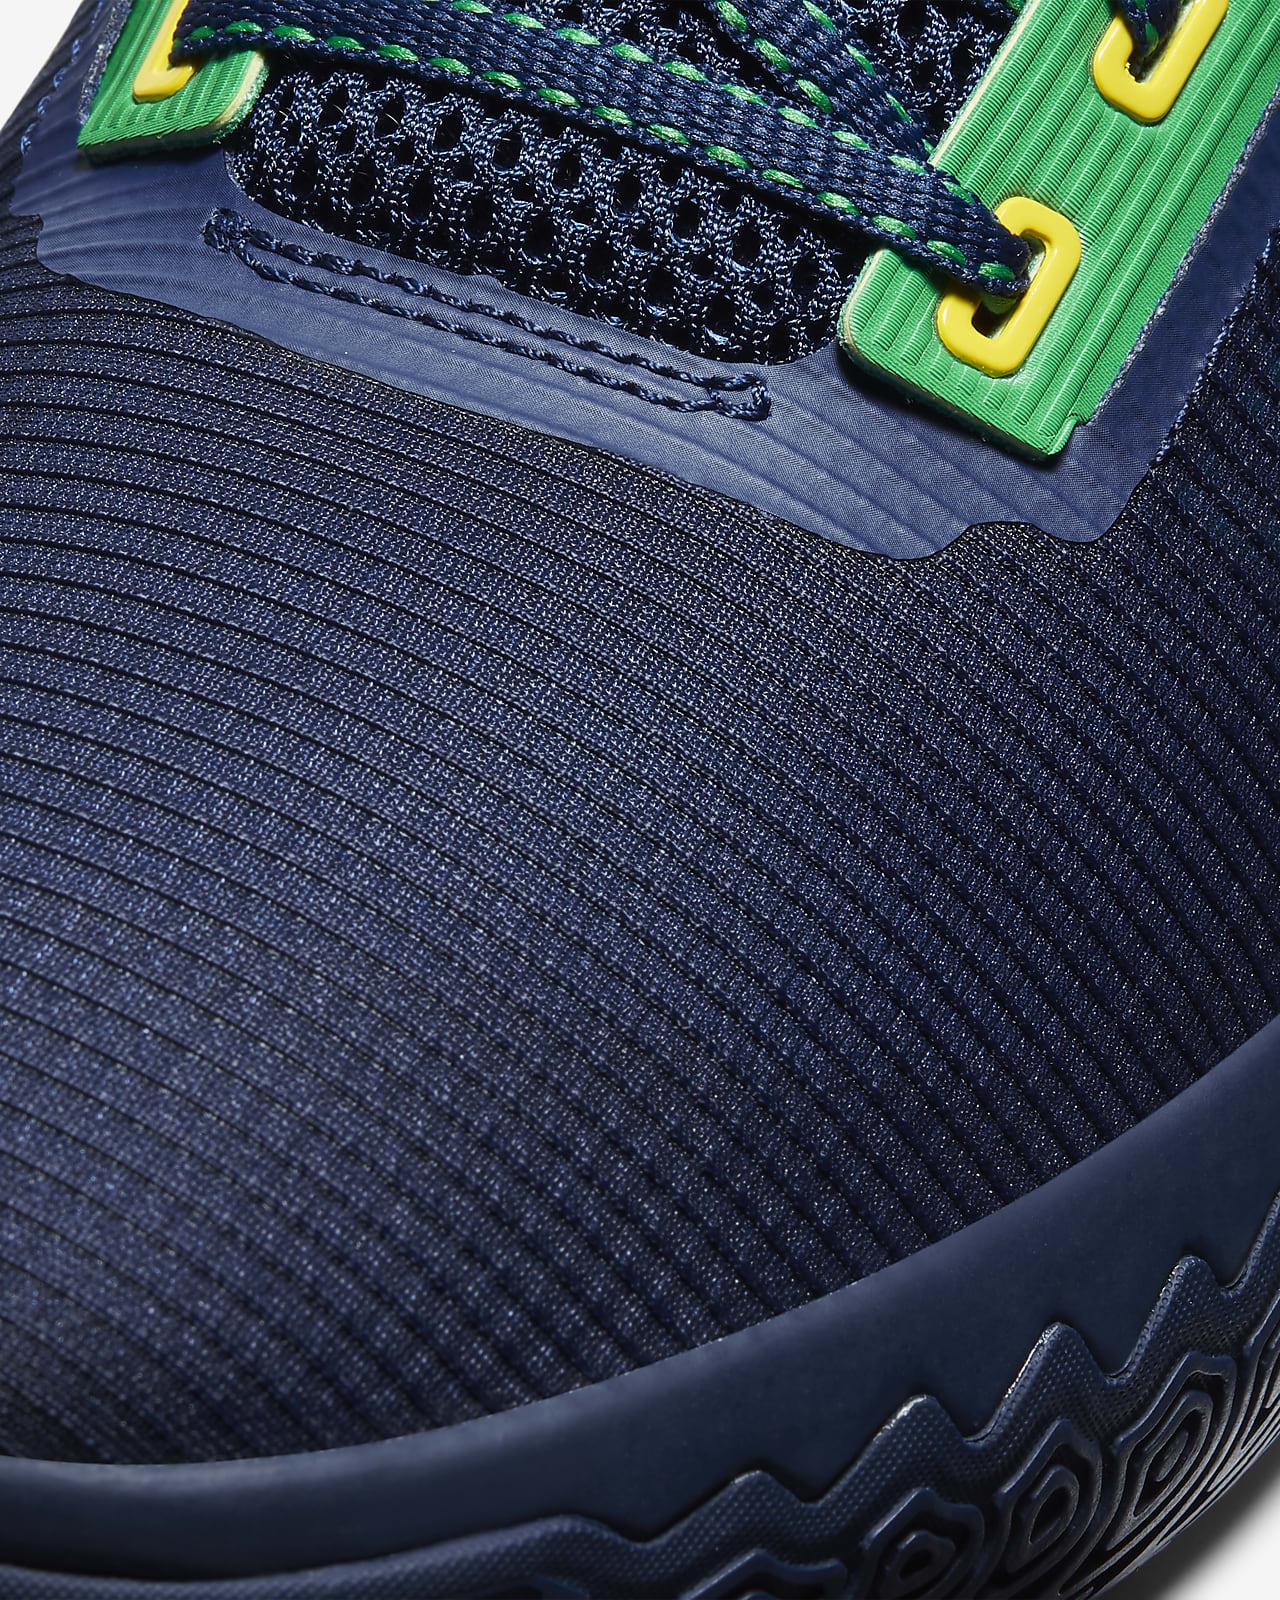 Kyrie Flytrap 4 EP Basketball Shoe. Nike ID